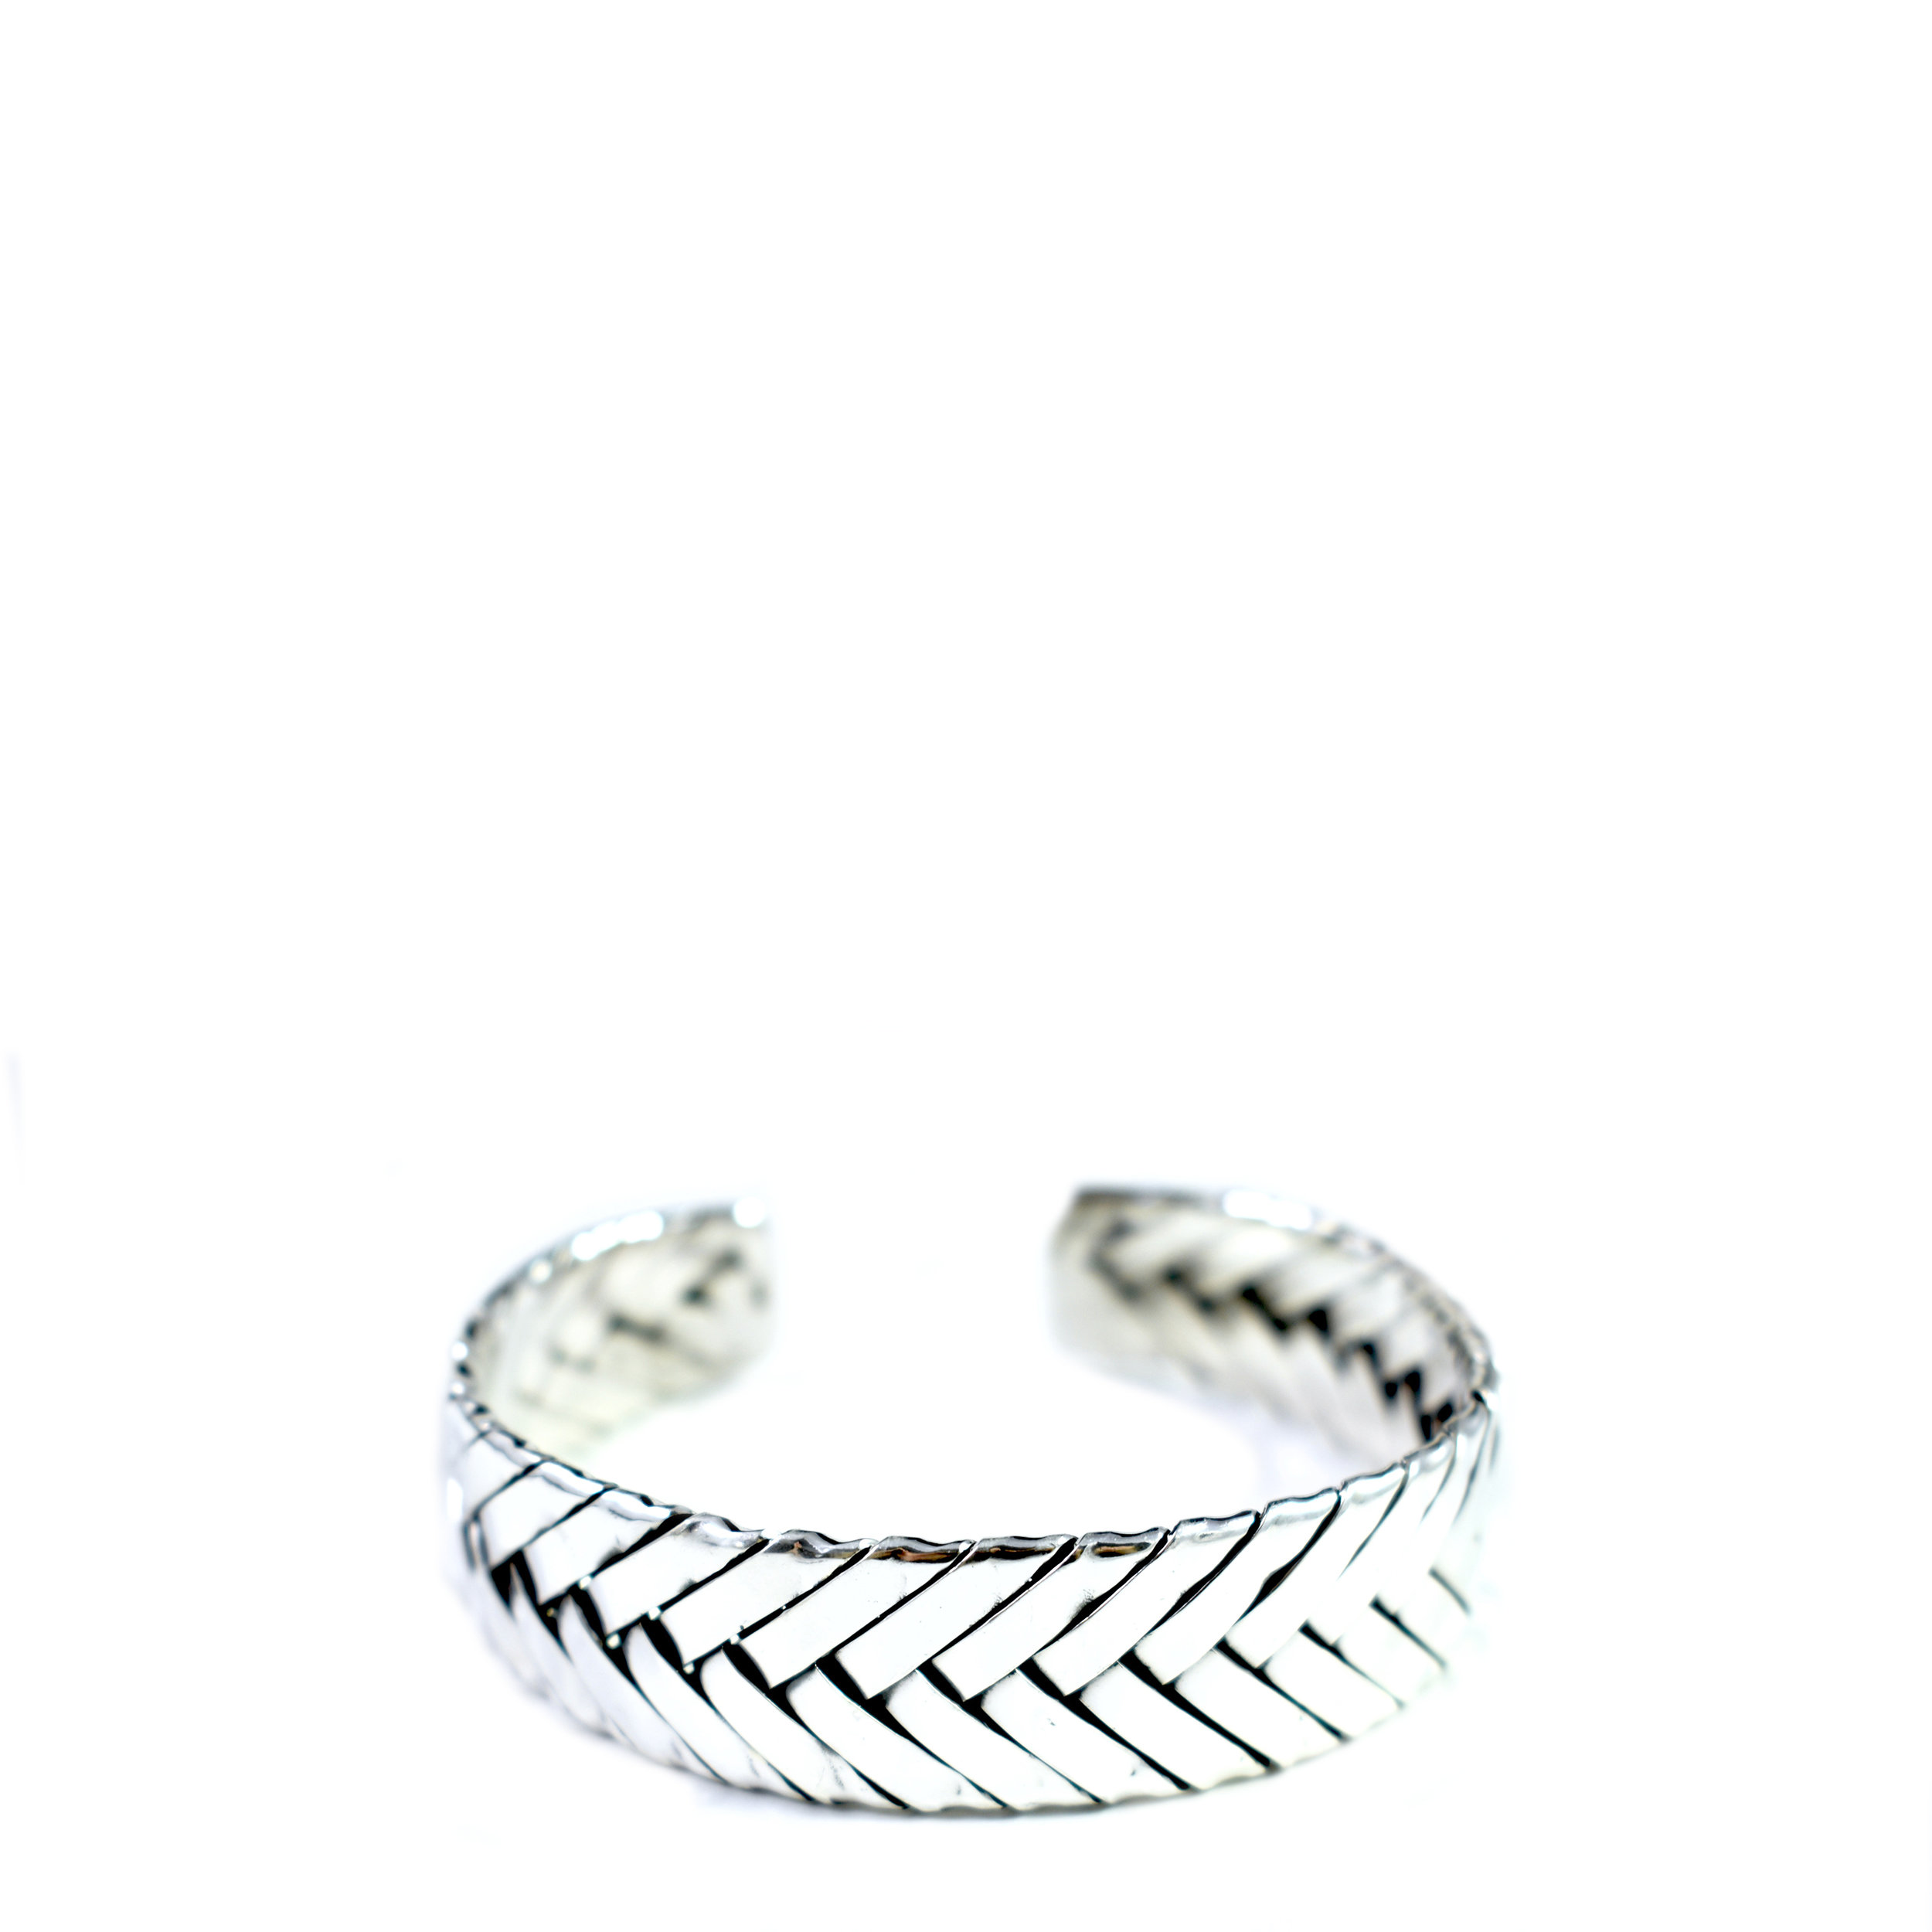 Shop Silver Bracelets - Bangles, Cuffs, & Charm Bracelets